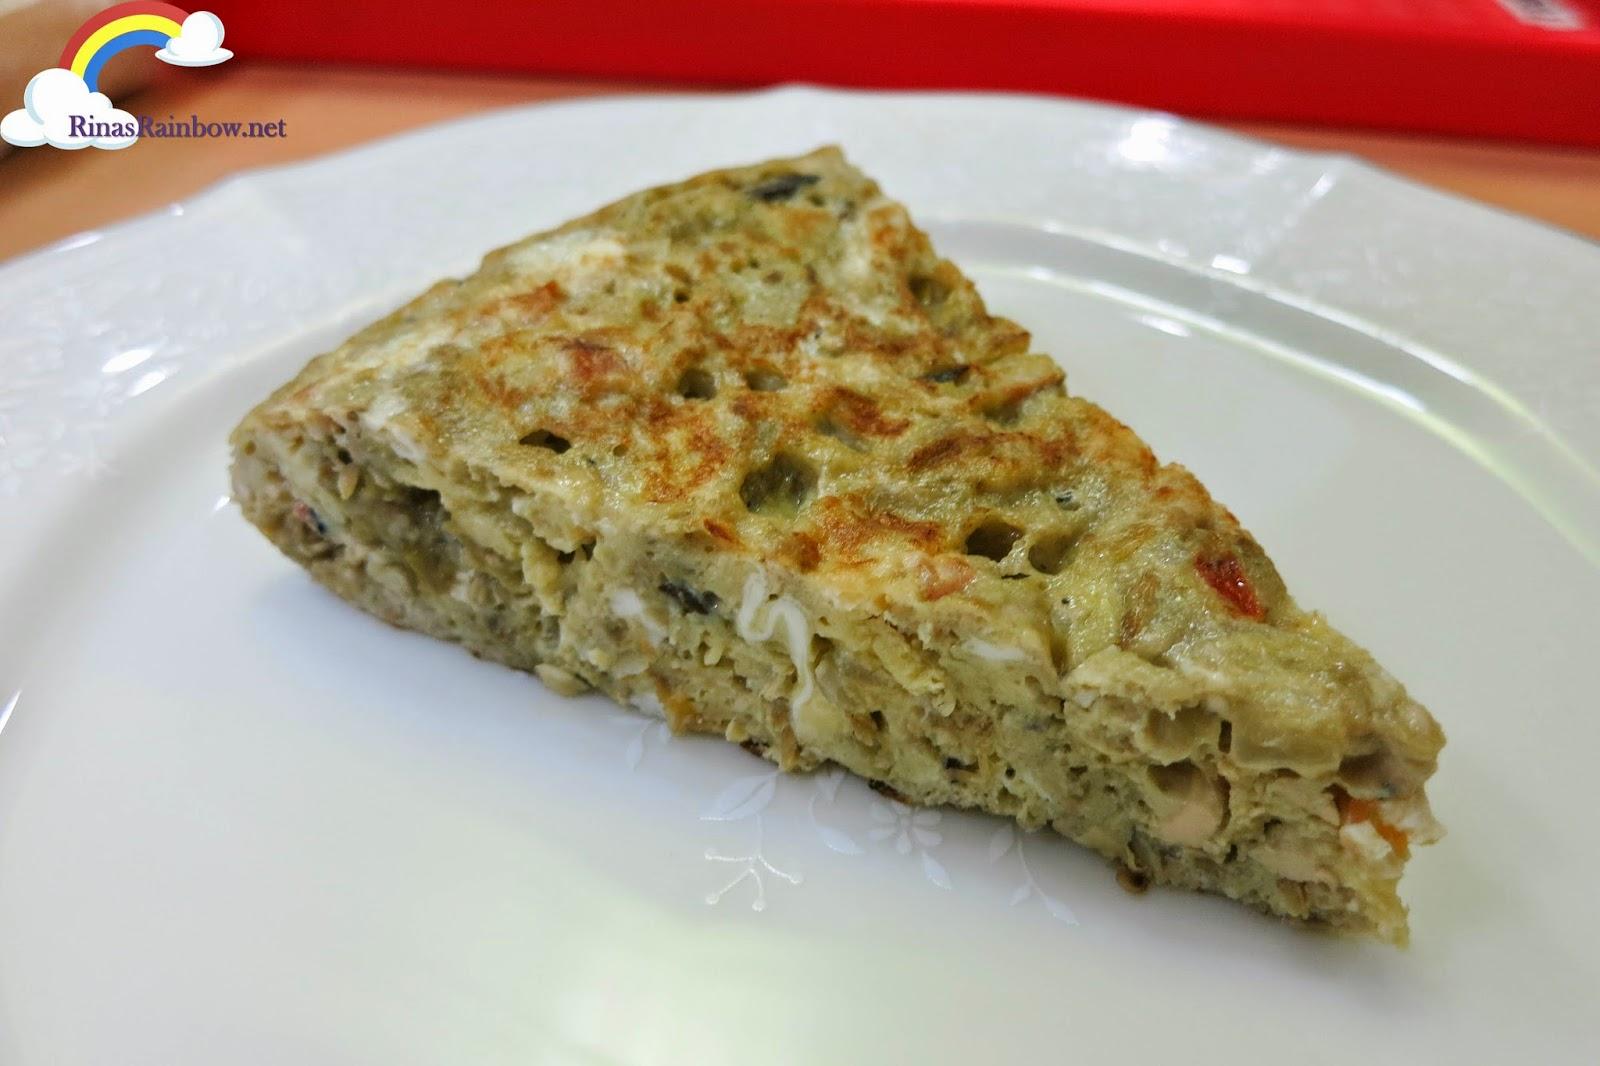 fritata